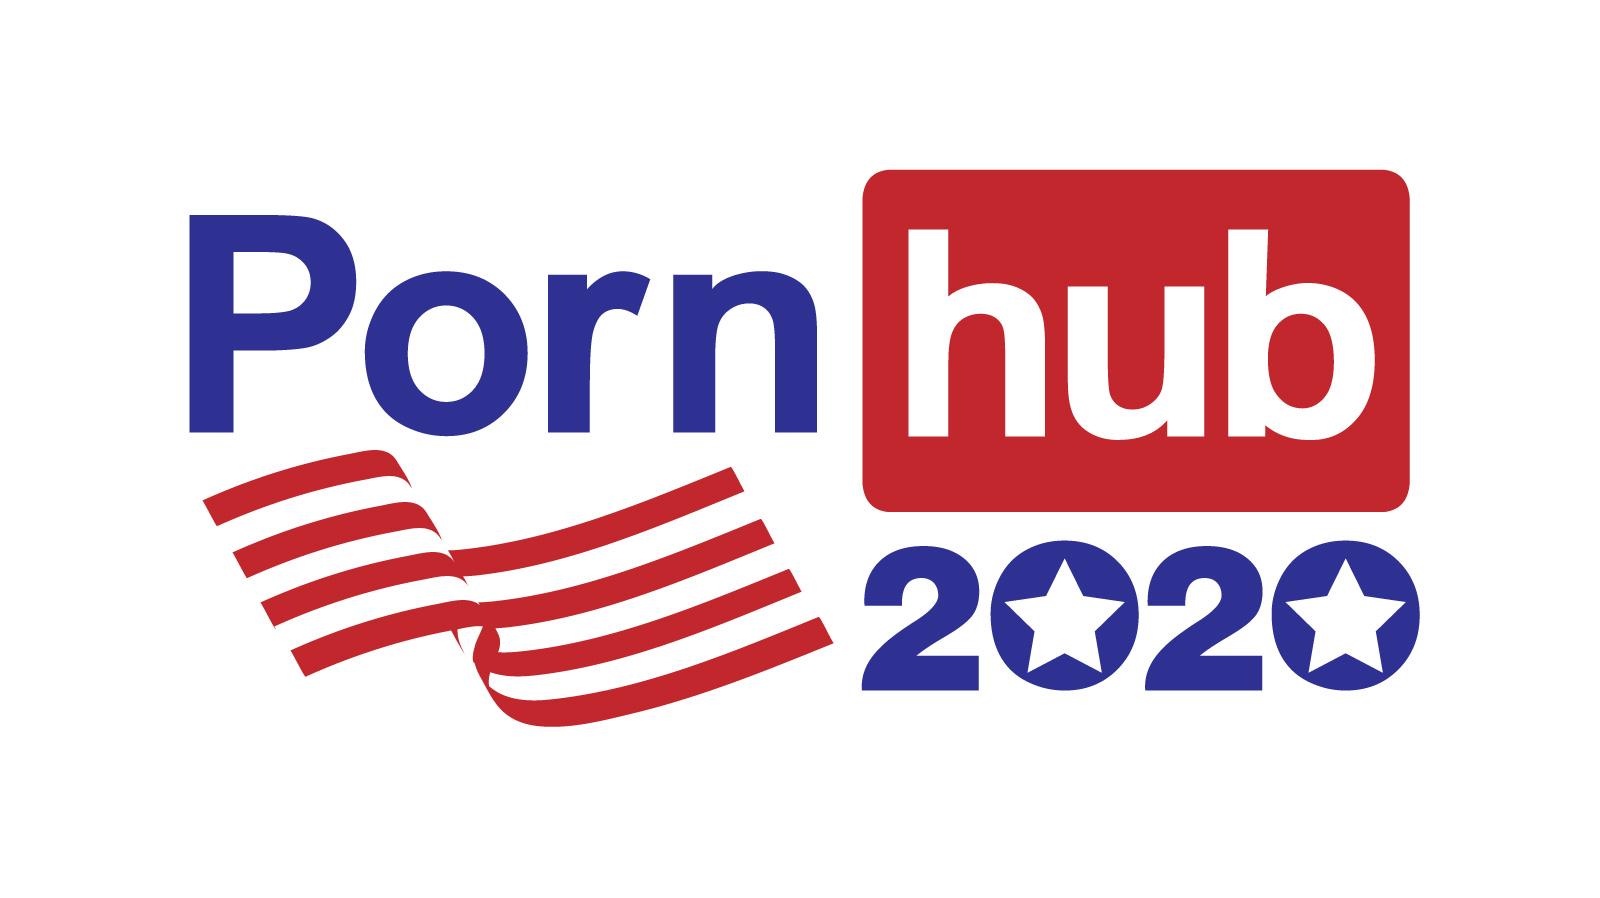 Pornhub-campaign-logo.jpg